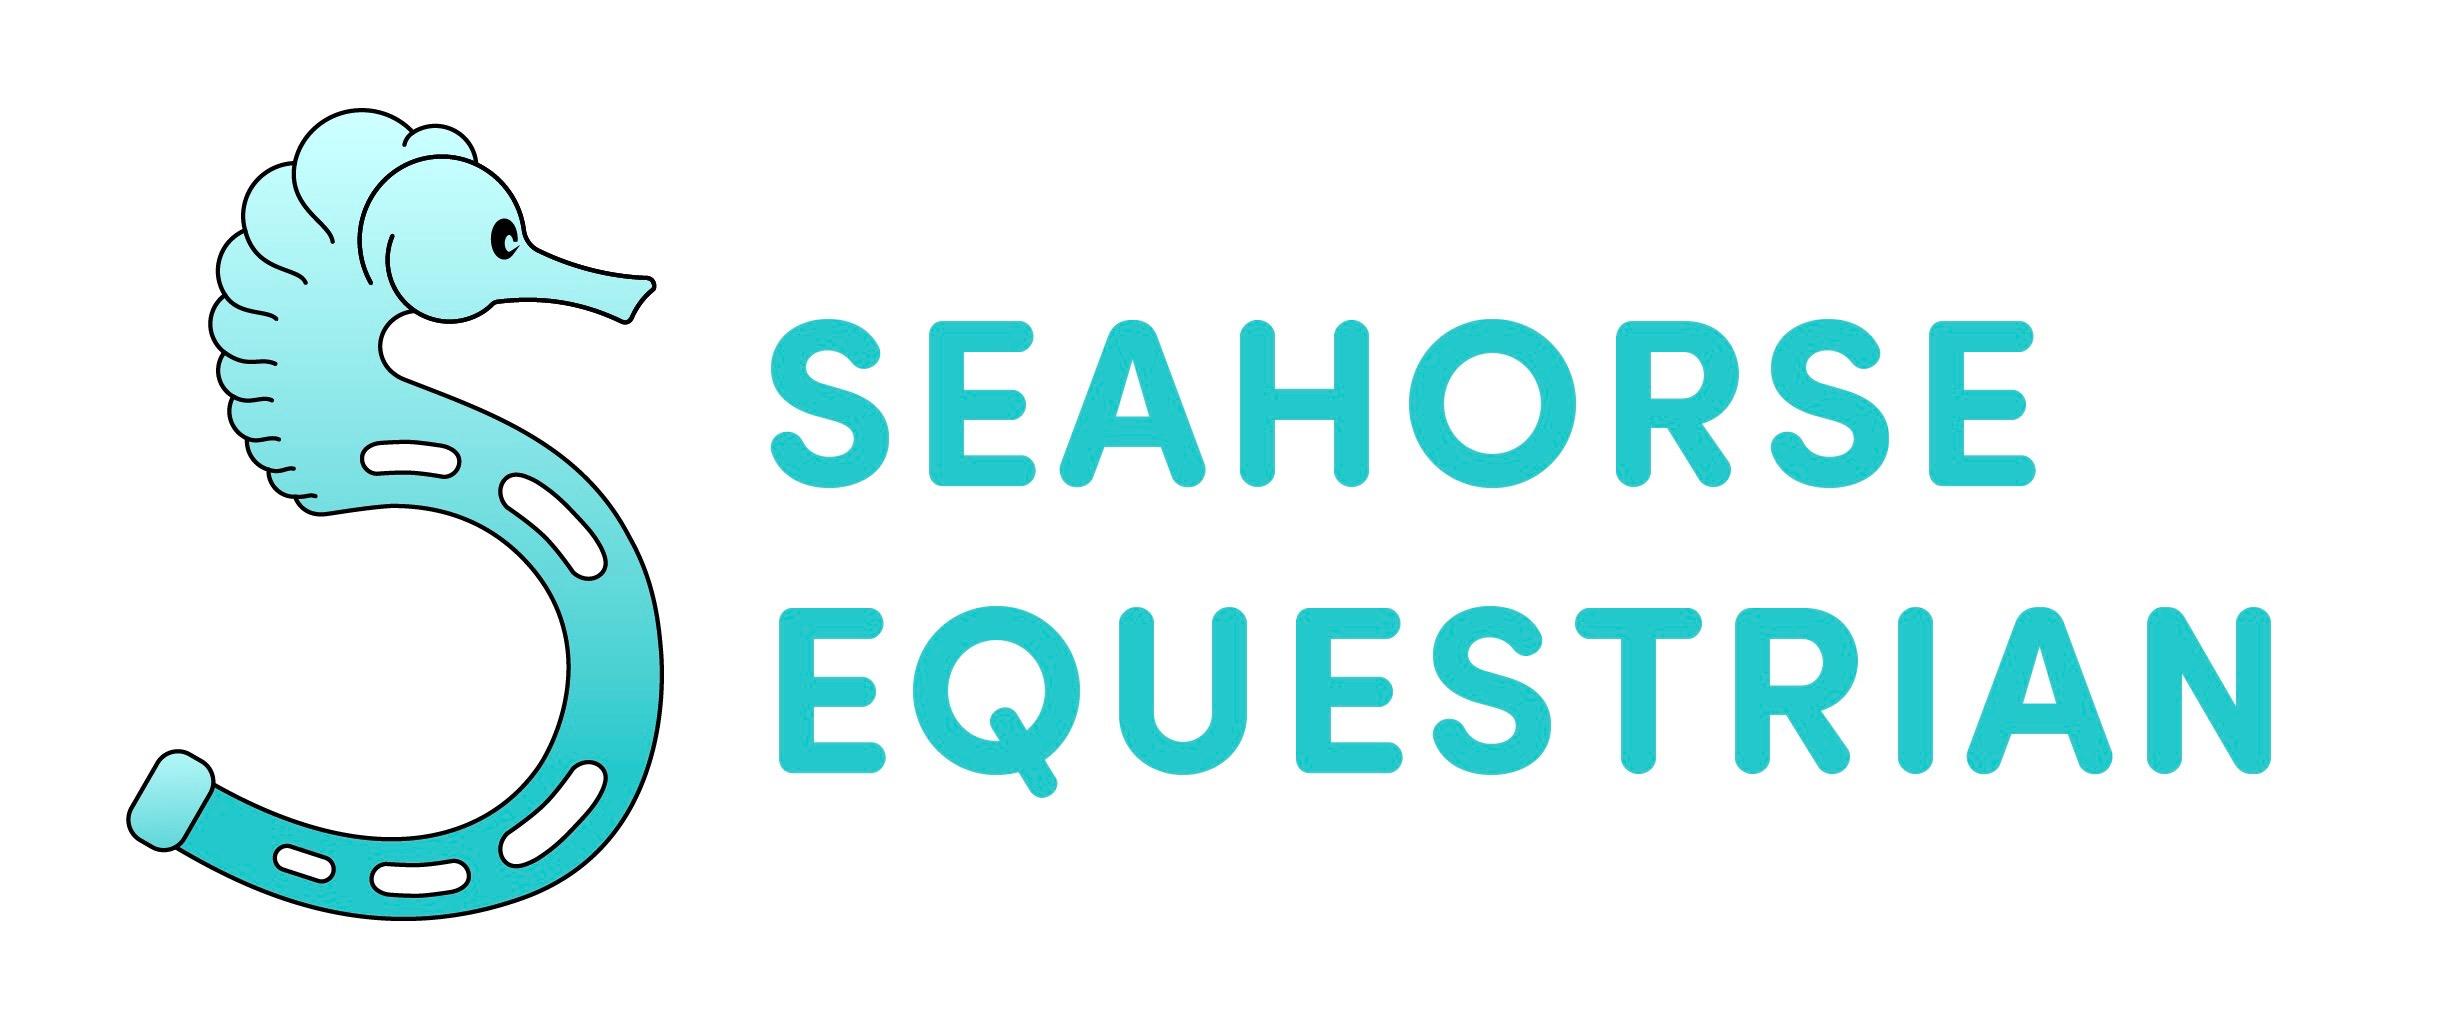 Seahorse Equestrian, LLC